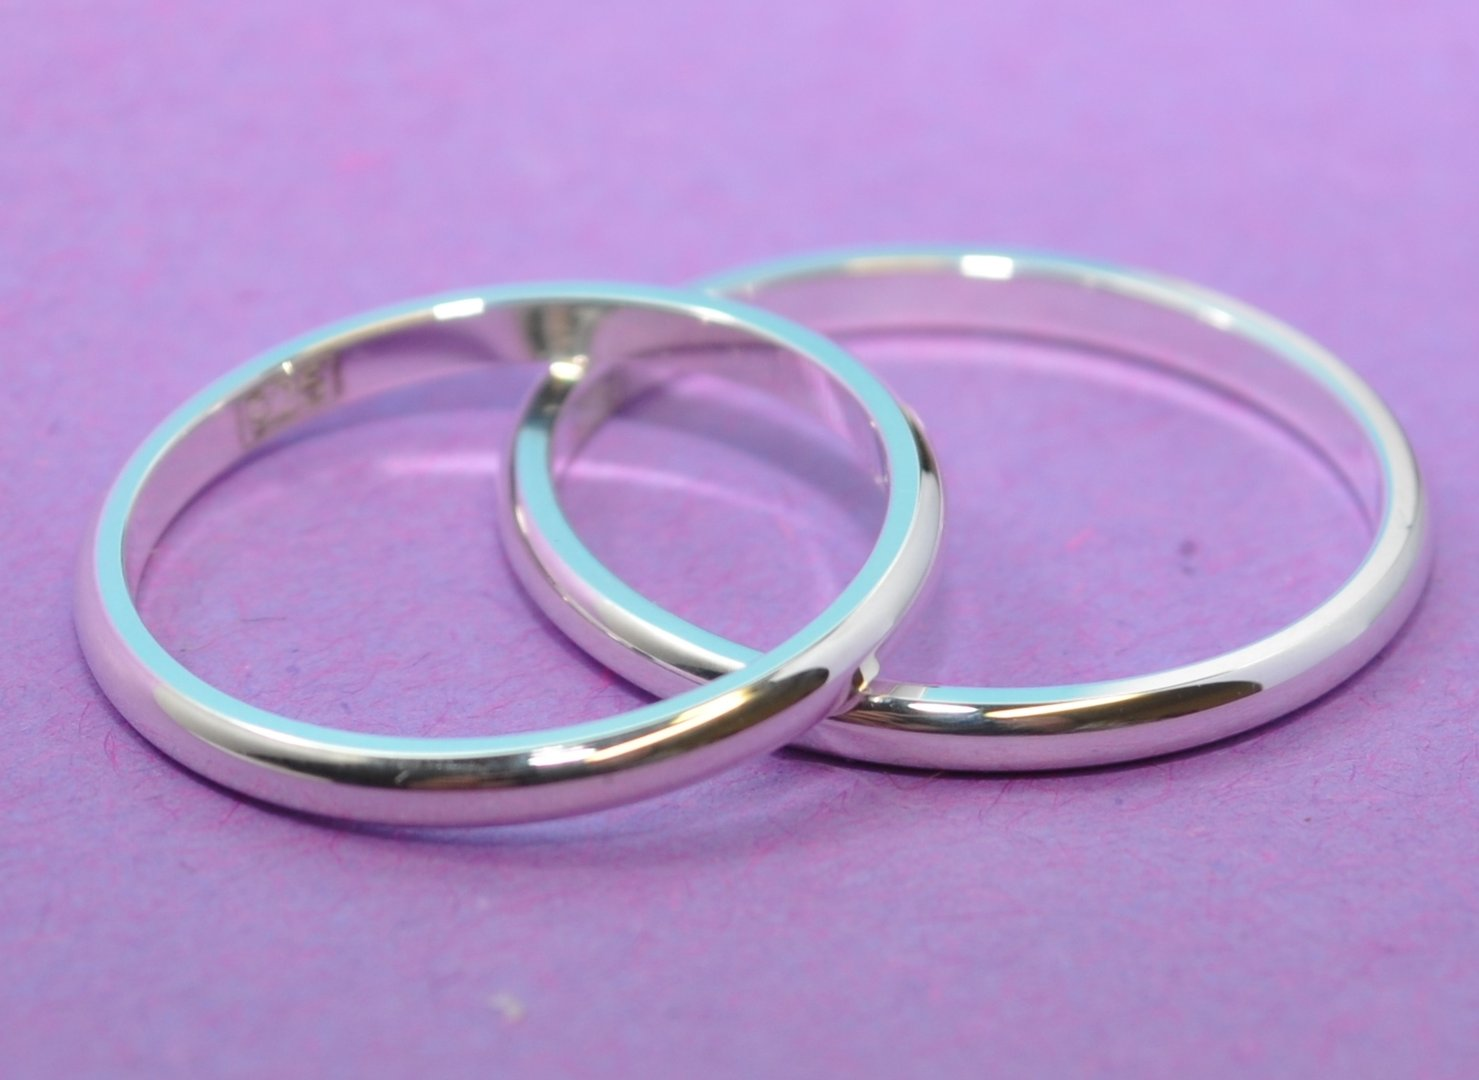 2 925 Silber Trauringe Eheringe Hochzeitsringe Verlobungsringe